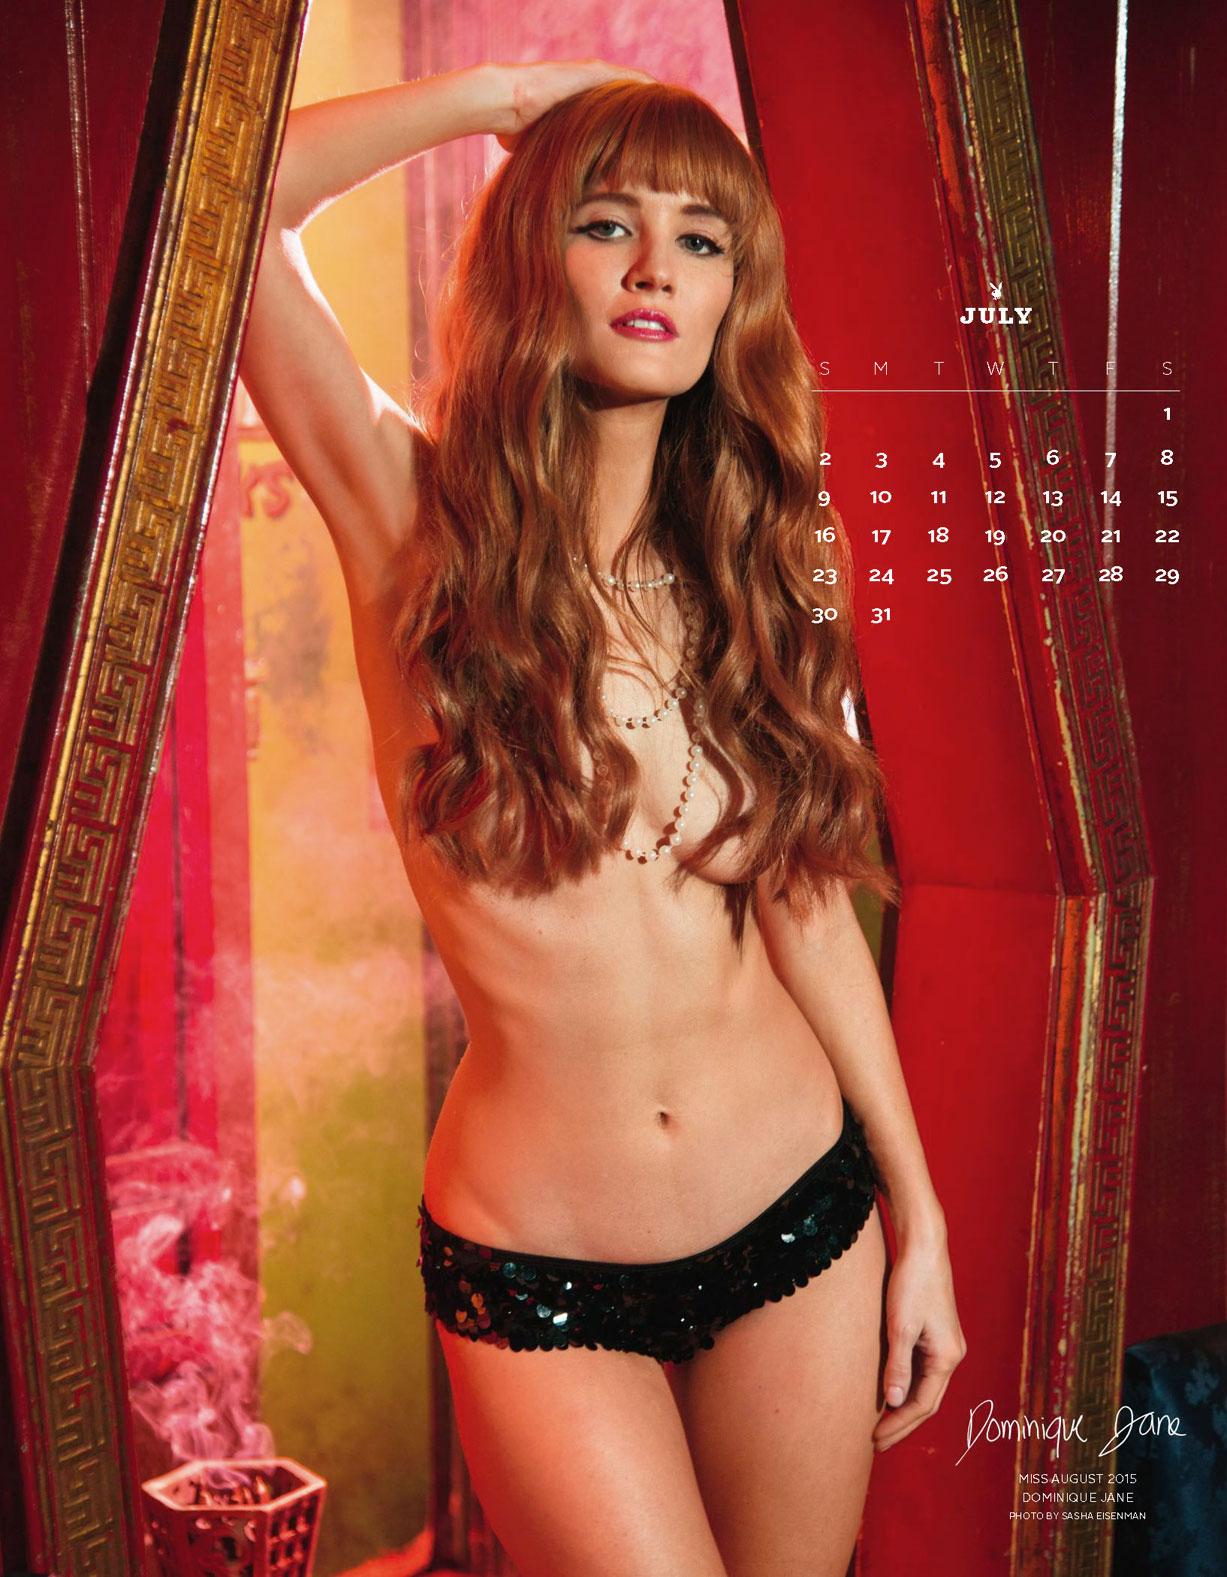 Playboy US Playmates 2017 calendar - Miss August 2015 Dominique Jane / Доминик Джейн – Девушка месяца август 2015 журнала Плейбой США